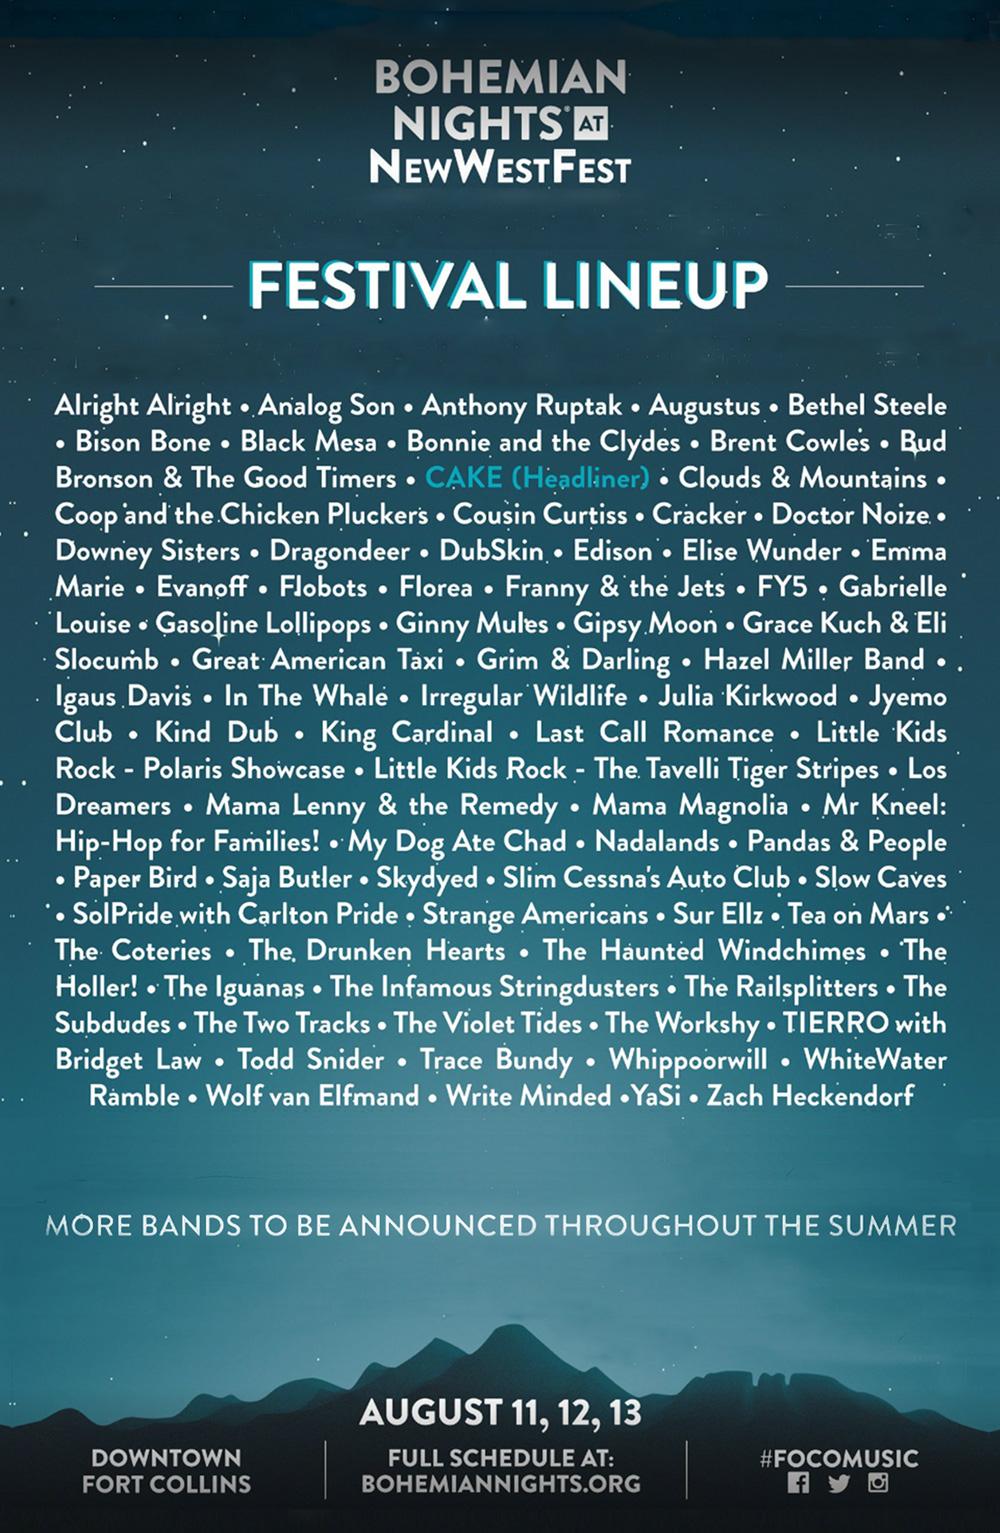 New-West-Fest-11x17-W-Bleed